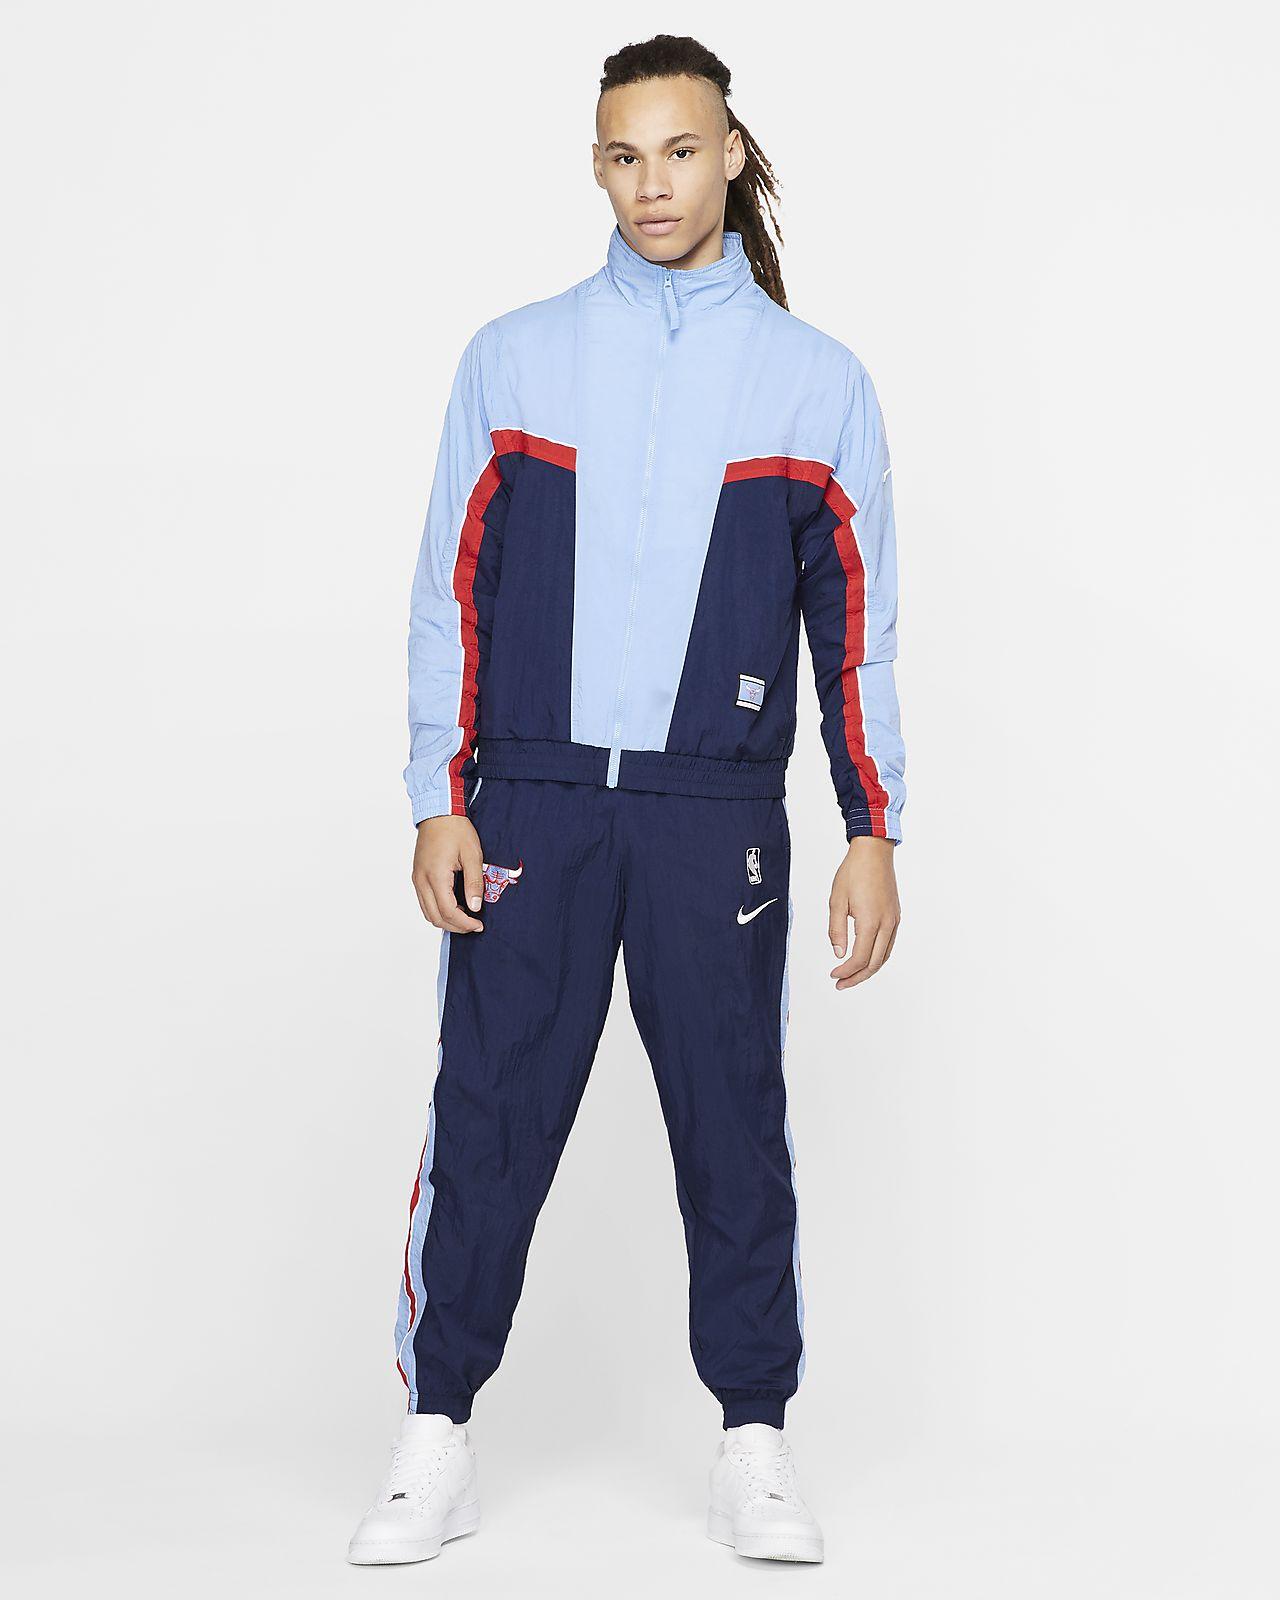 Fato de treino de menino Sportswear Nike